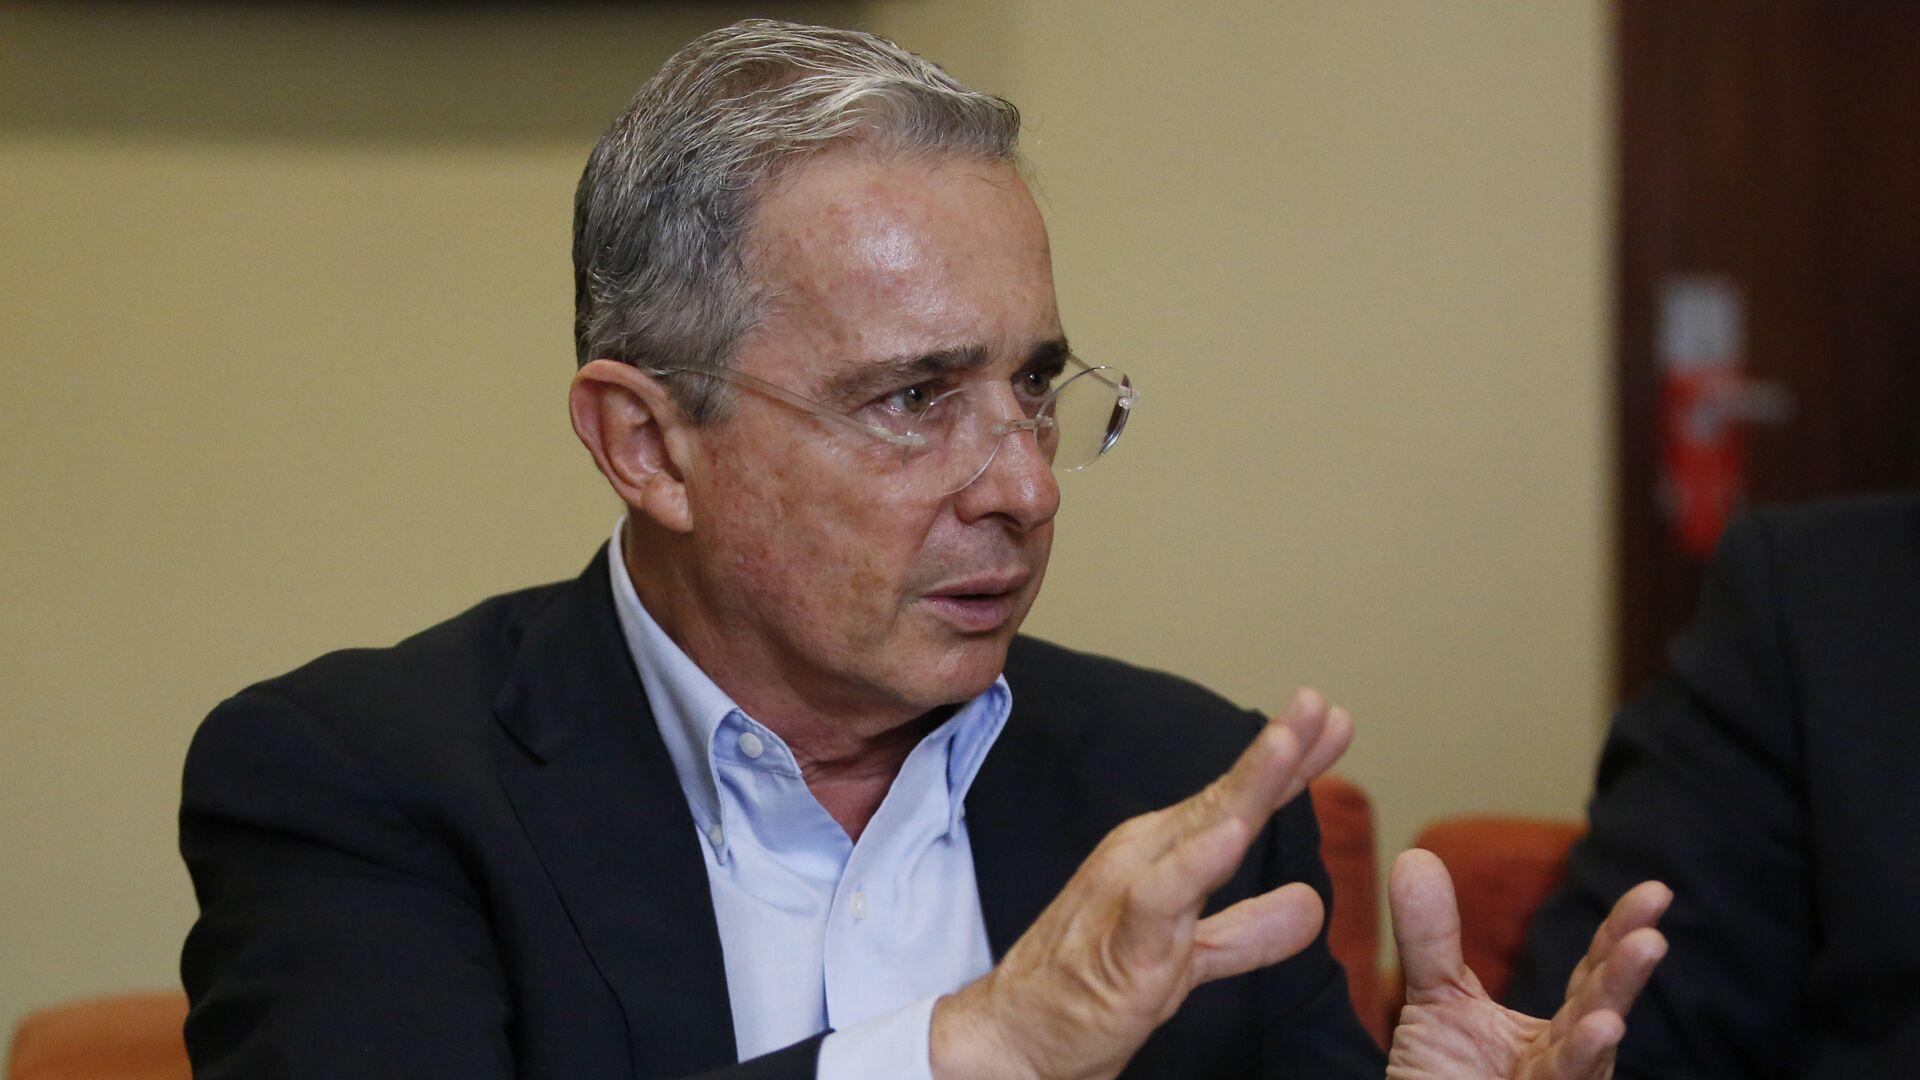 Álvaro Uribe Vélez, expresidente de Colombia - Sputnik Mundo, 1920, 16.08.2021